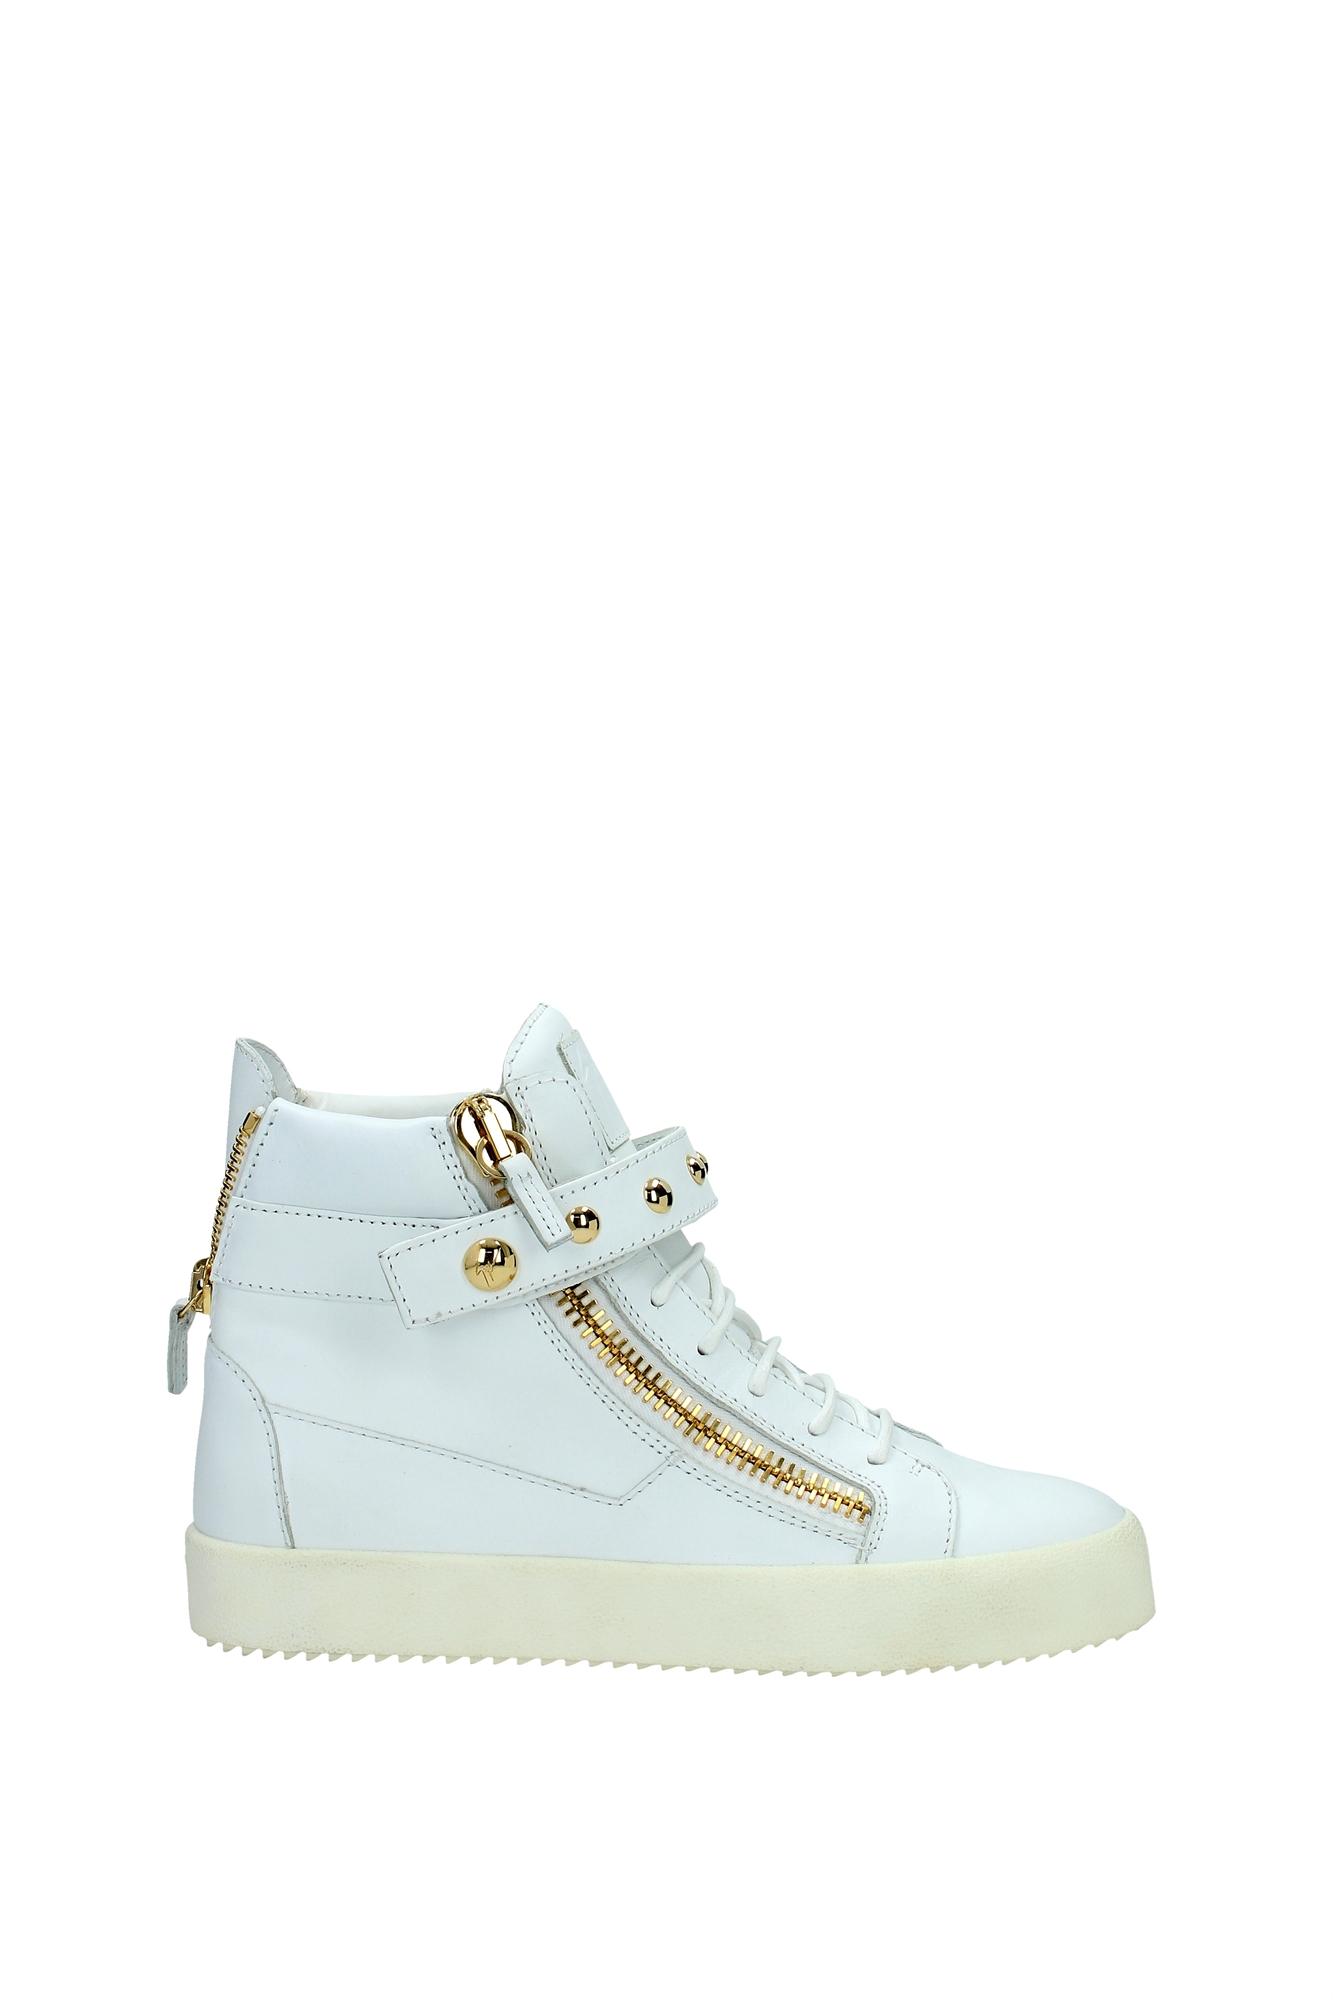 sneakers giuseppe zanotti leather white